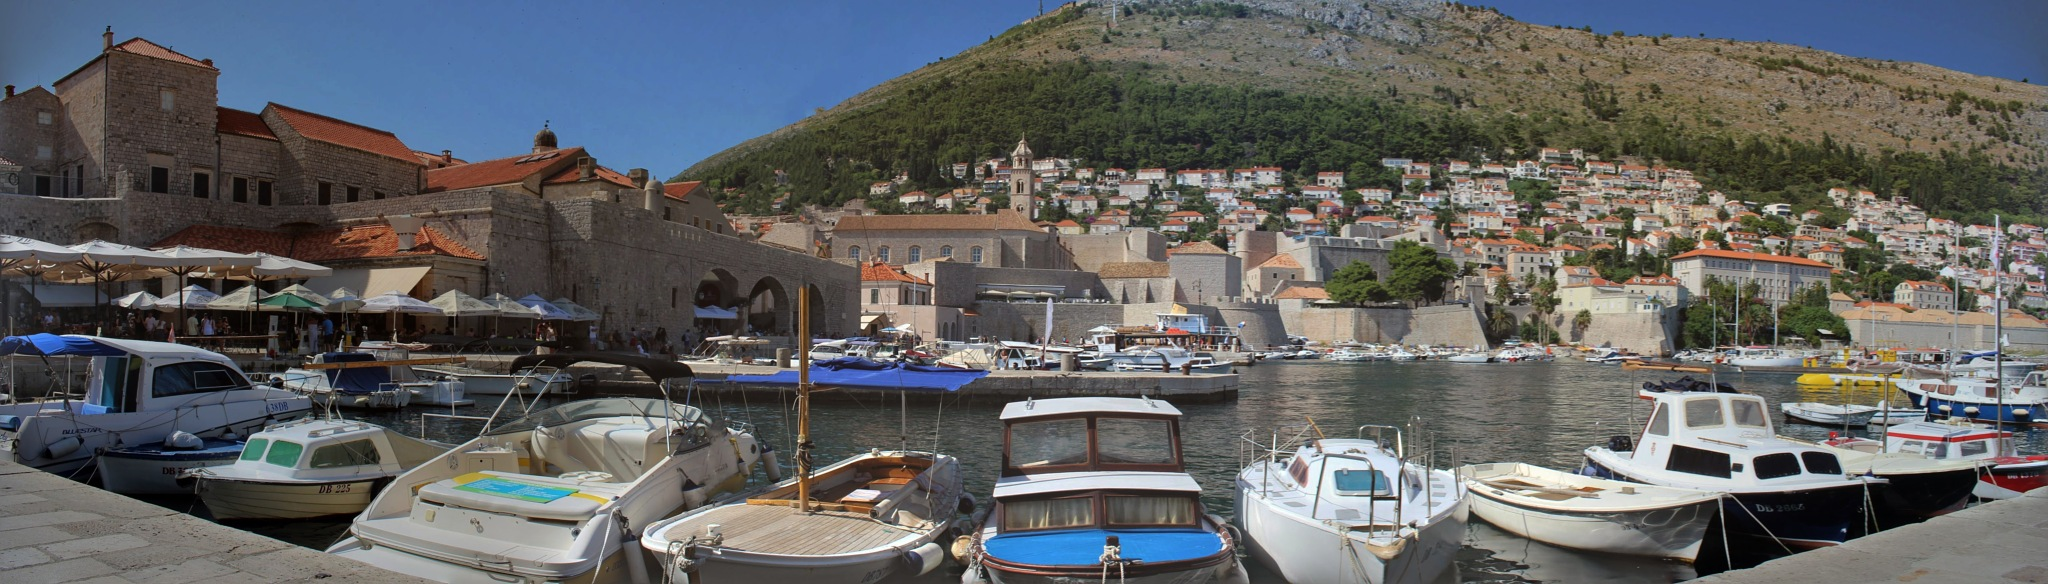 Croatia by horvathandrasgyorgy